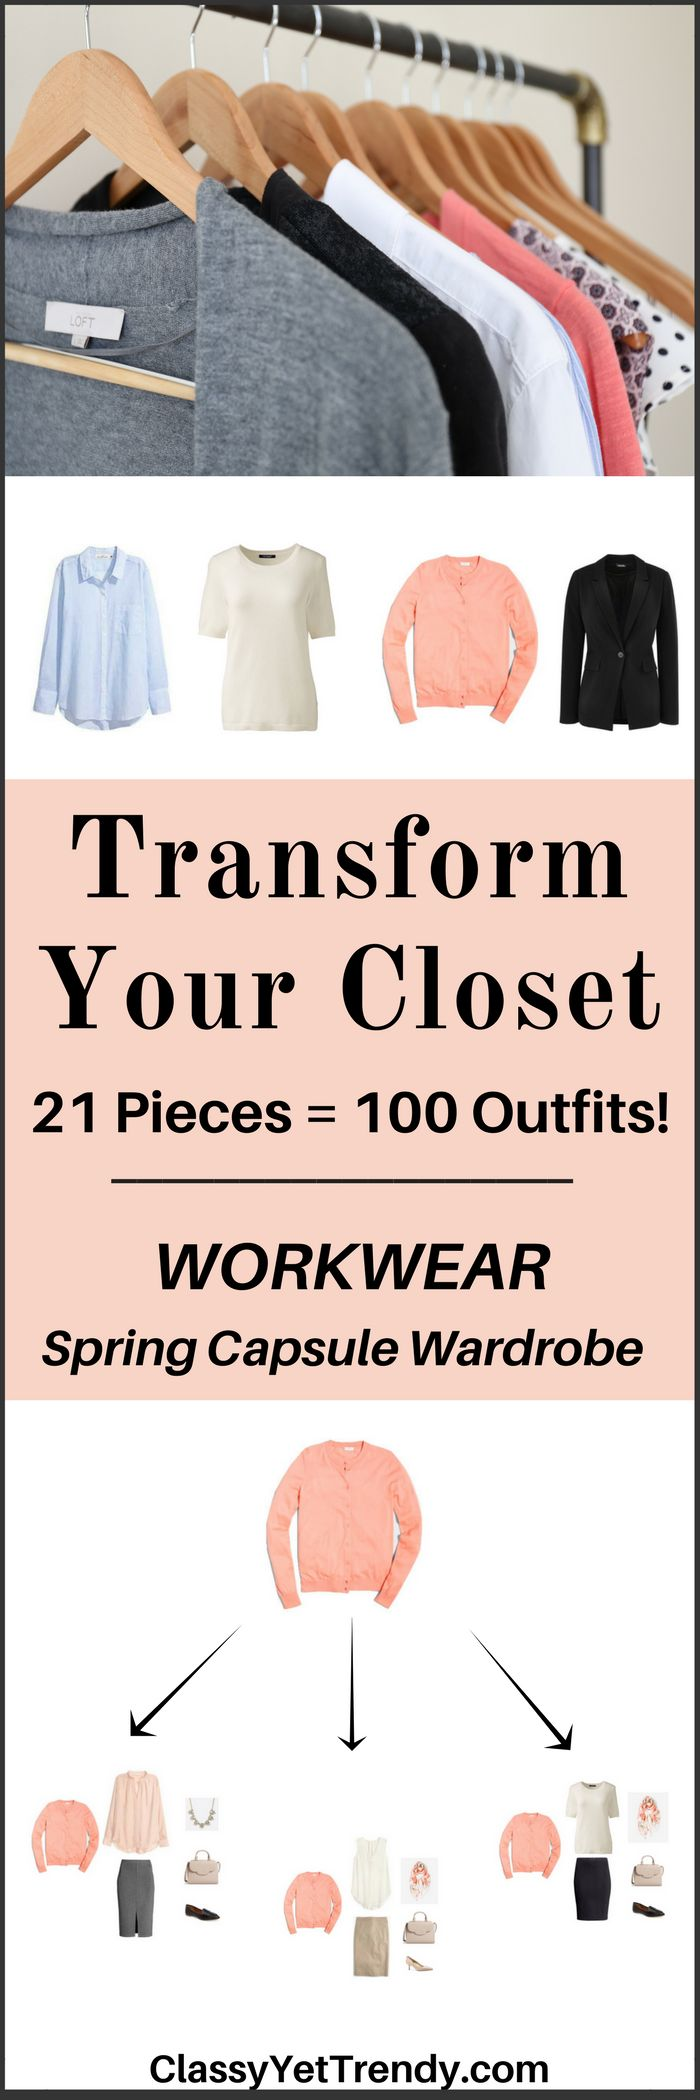 Spring Capsule Wardrobe: Best 25+ Capsule Wardrobe Work Ideas Only On Pinterest